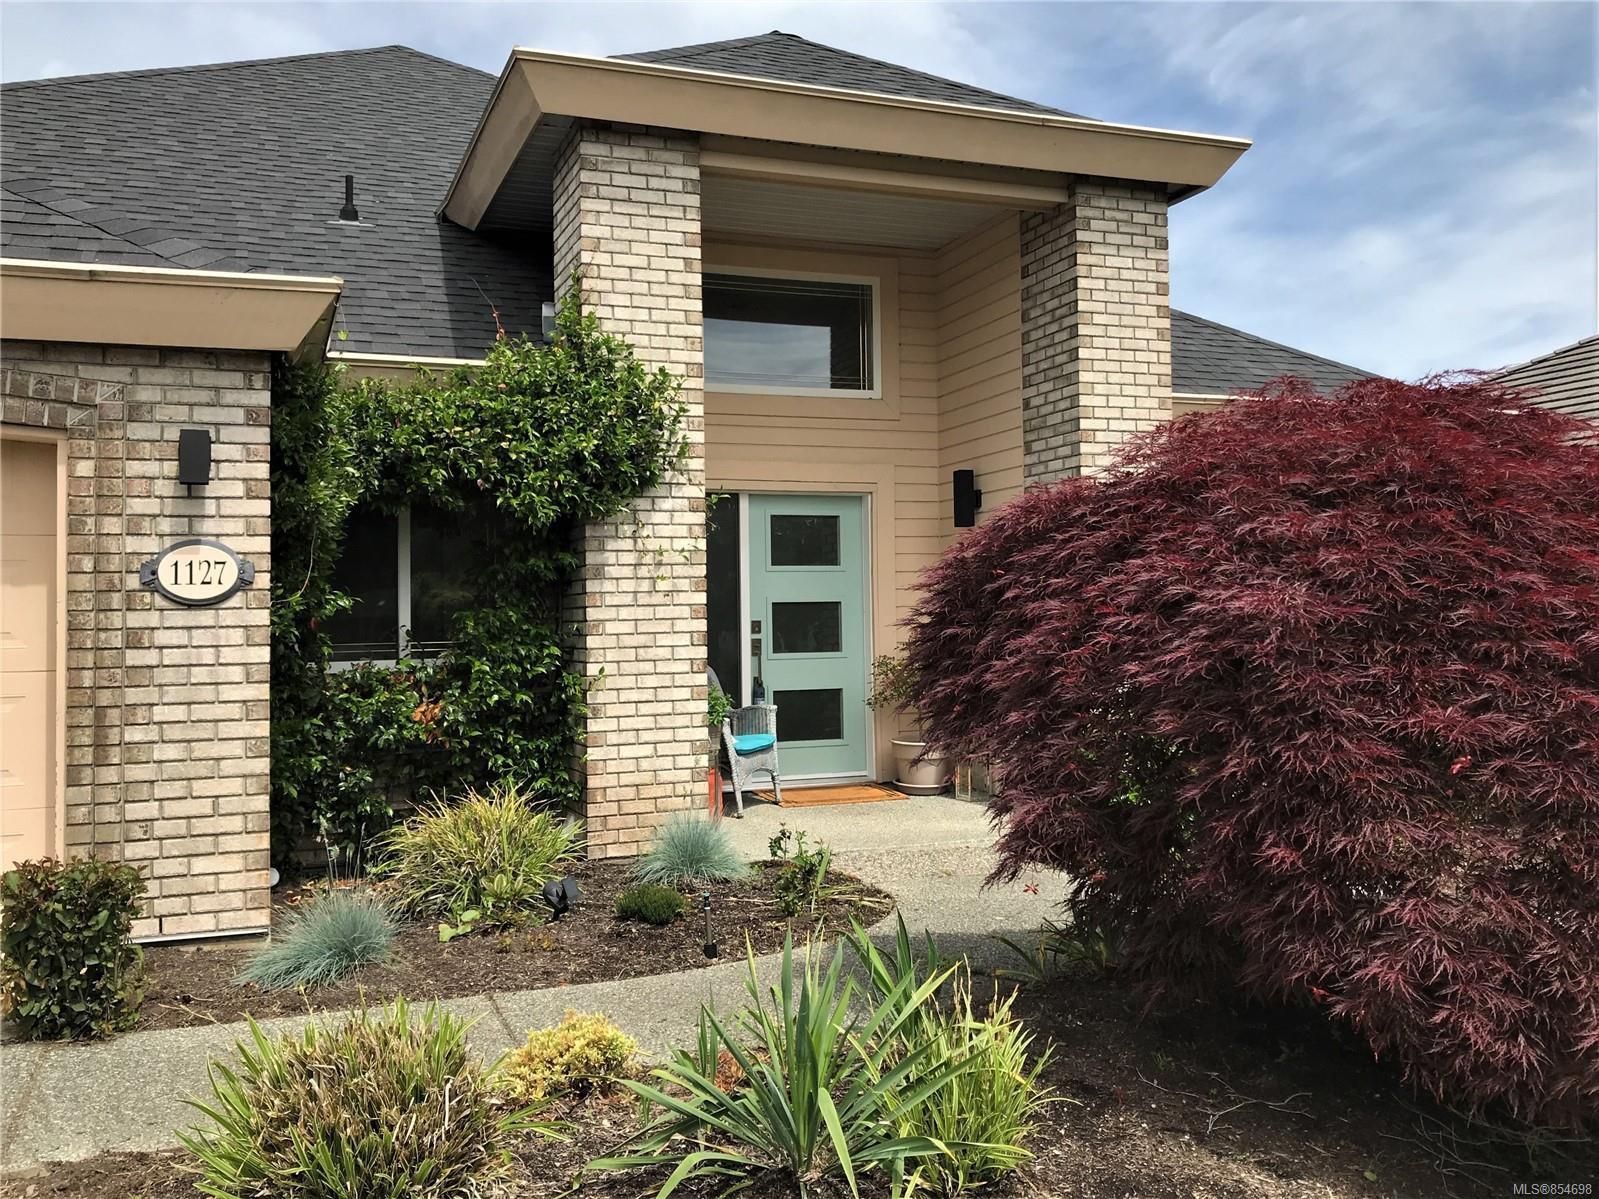 Main Photo: 1127 Ormonde Rd in : PQ Qualicum Beach House for sale (Parksville/Qualicum)  : MLS®# 854698